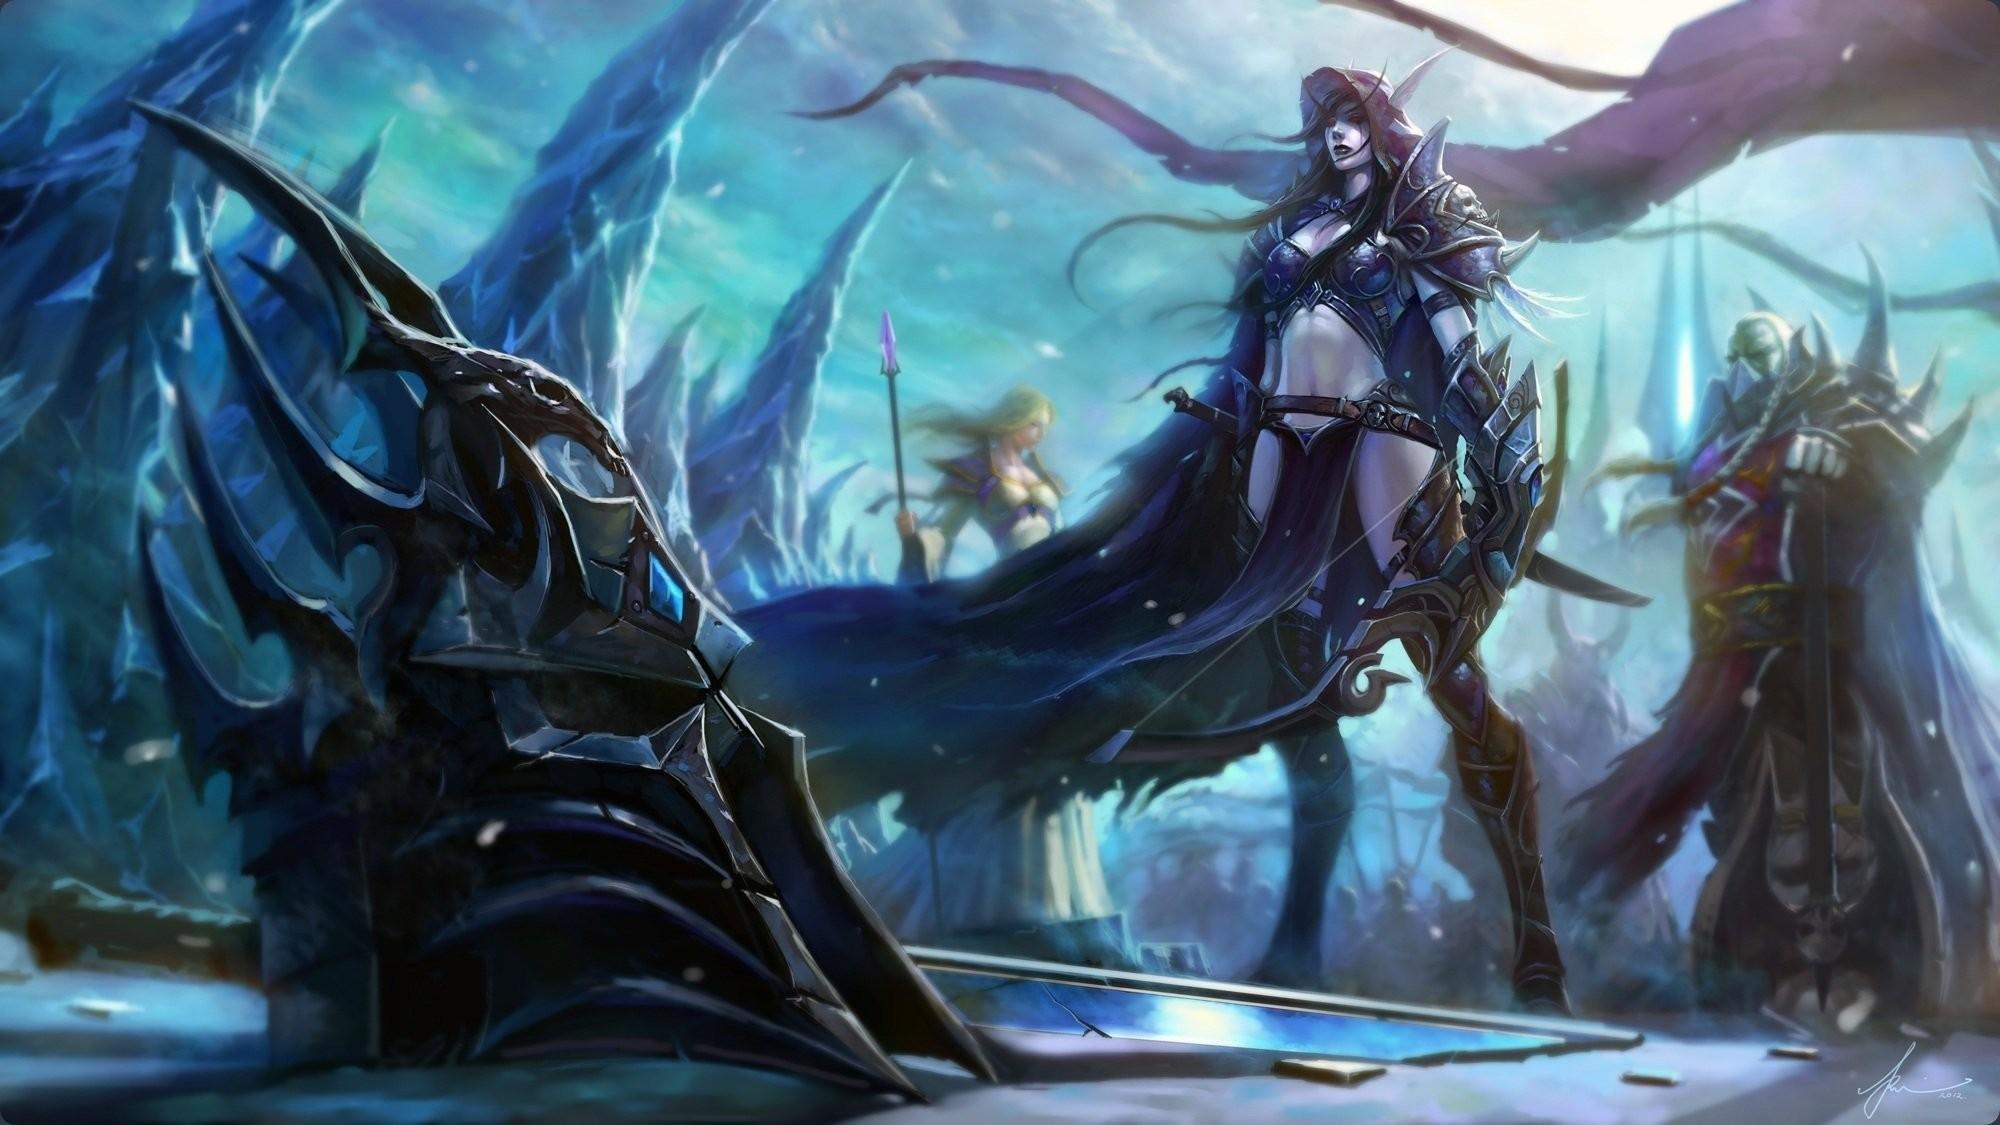 wow world of warcraft wotlk wrath of the lich king sylvanas windrunner  sylvanas windrunner lady jaina